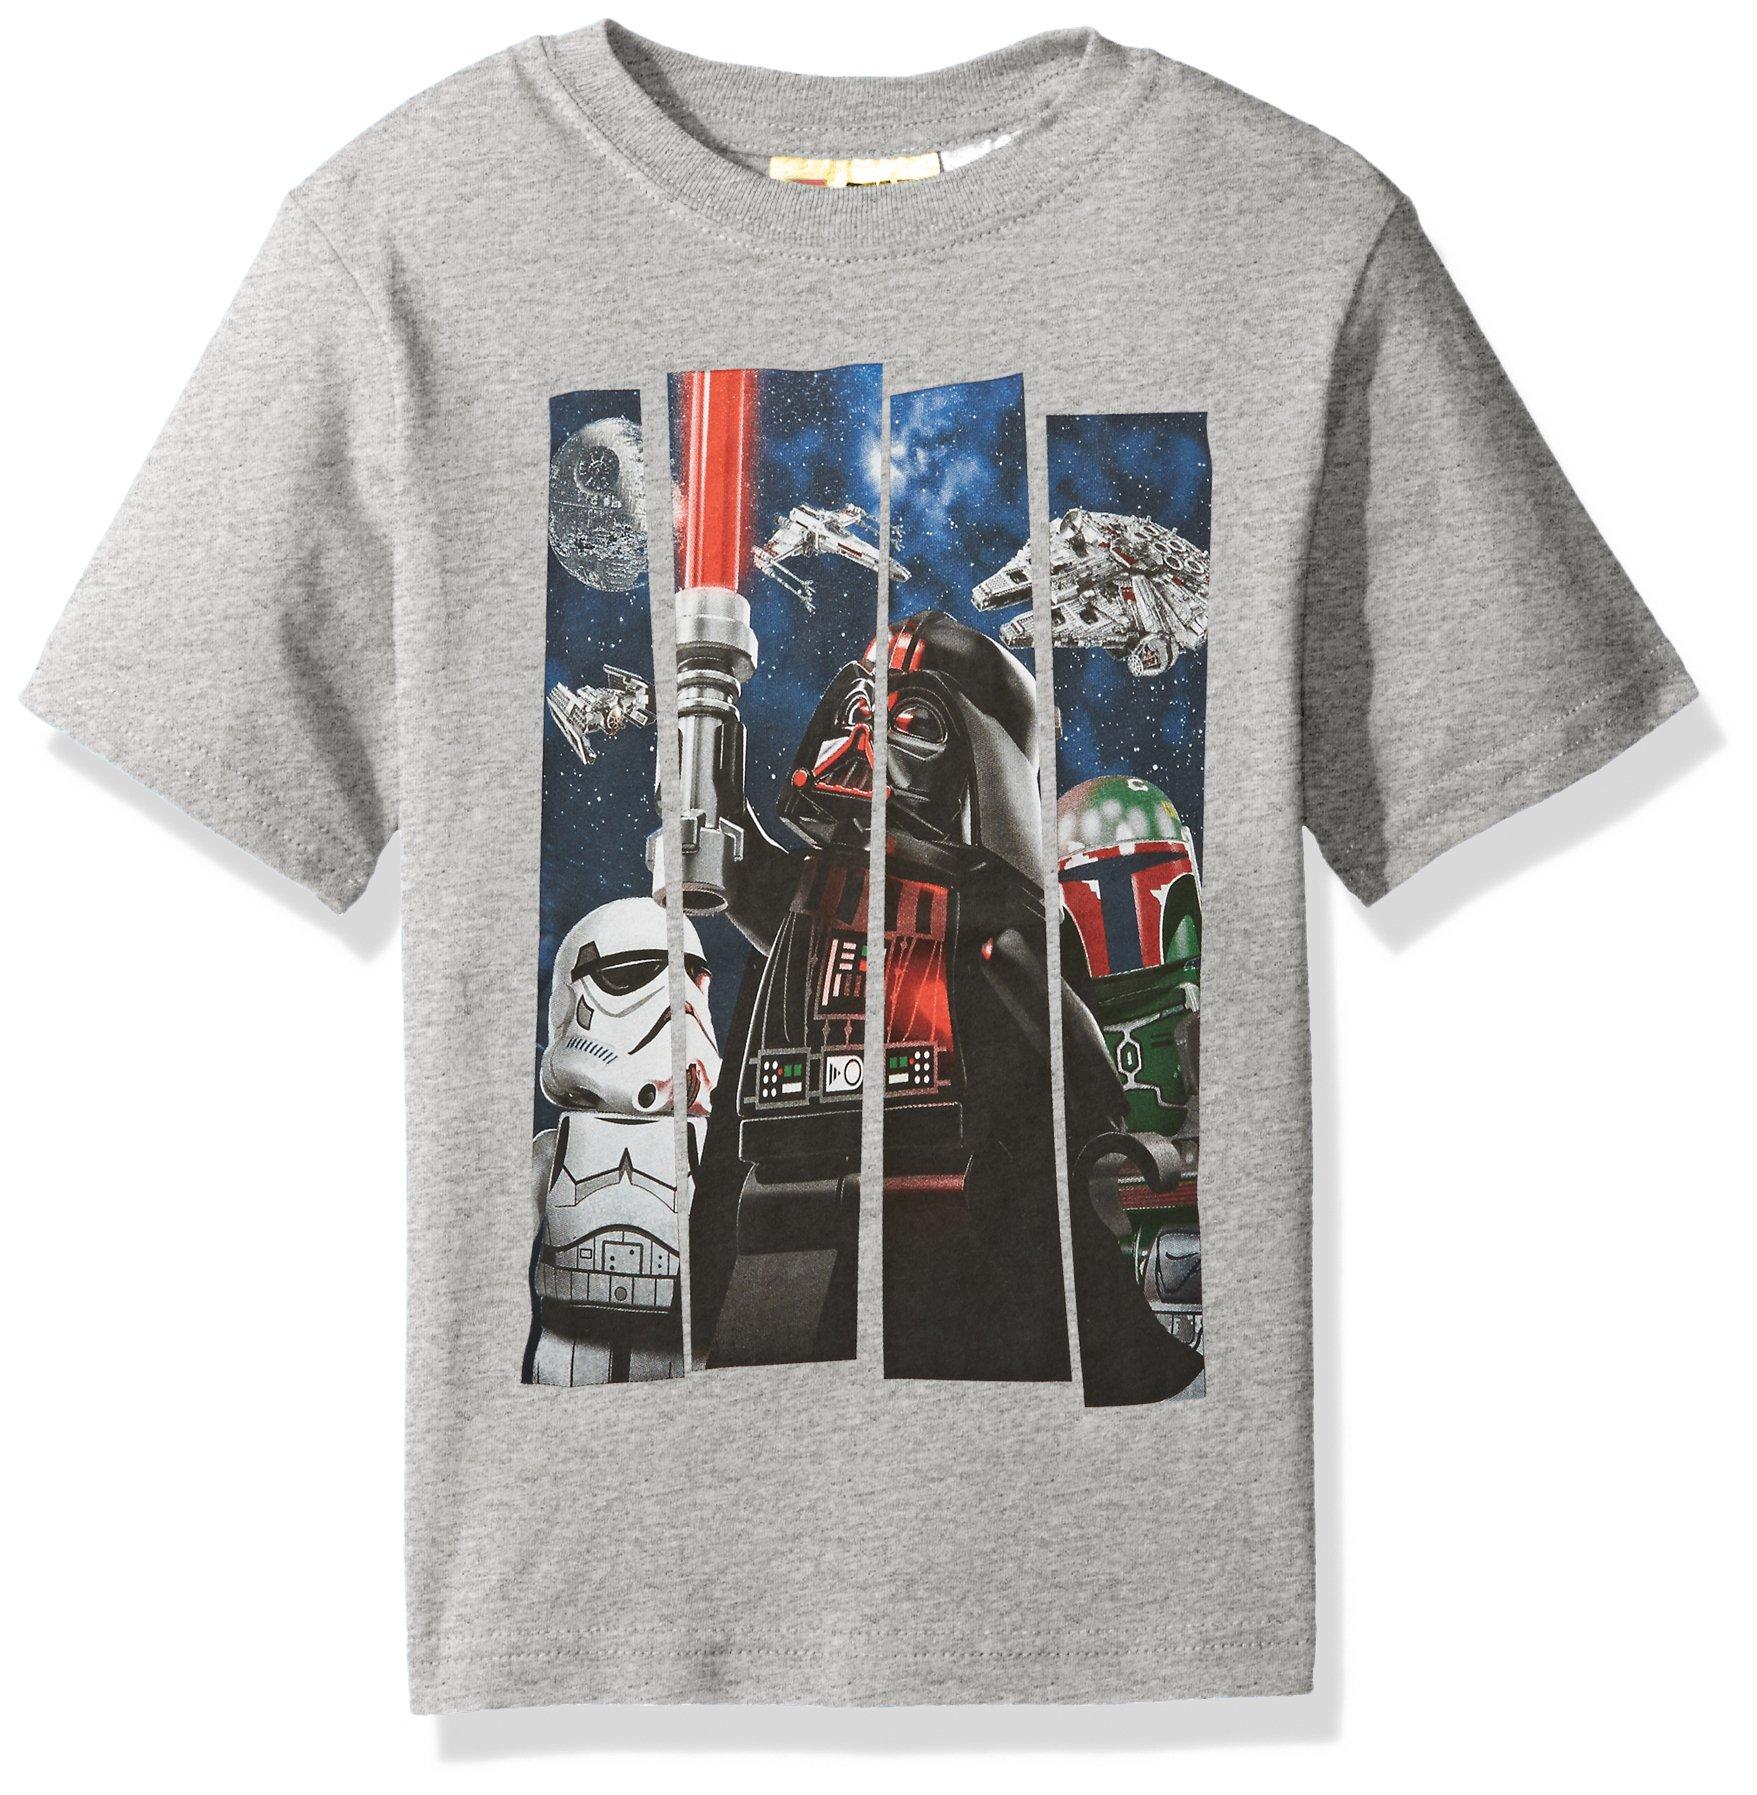 Star Wars Big Boys' Lego Darth Vader T-Shirt, Gray, 14/16